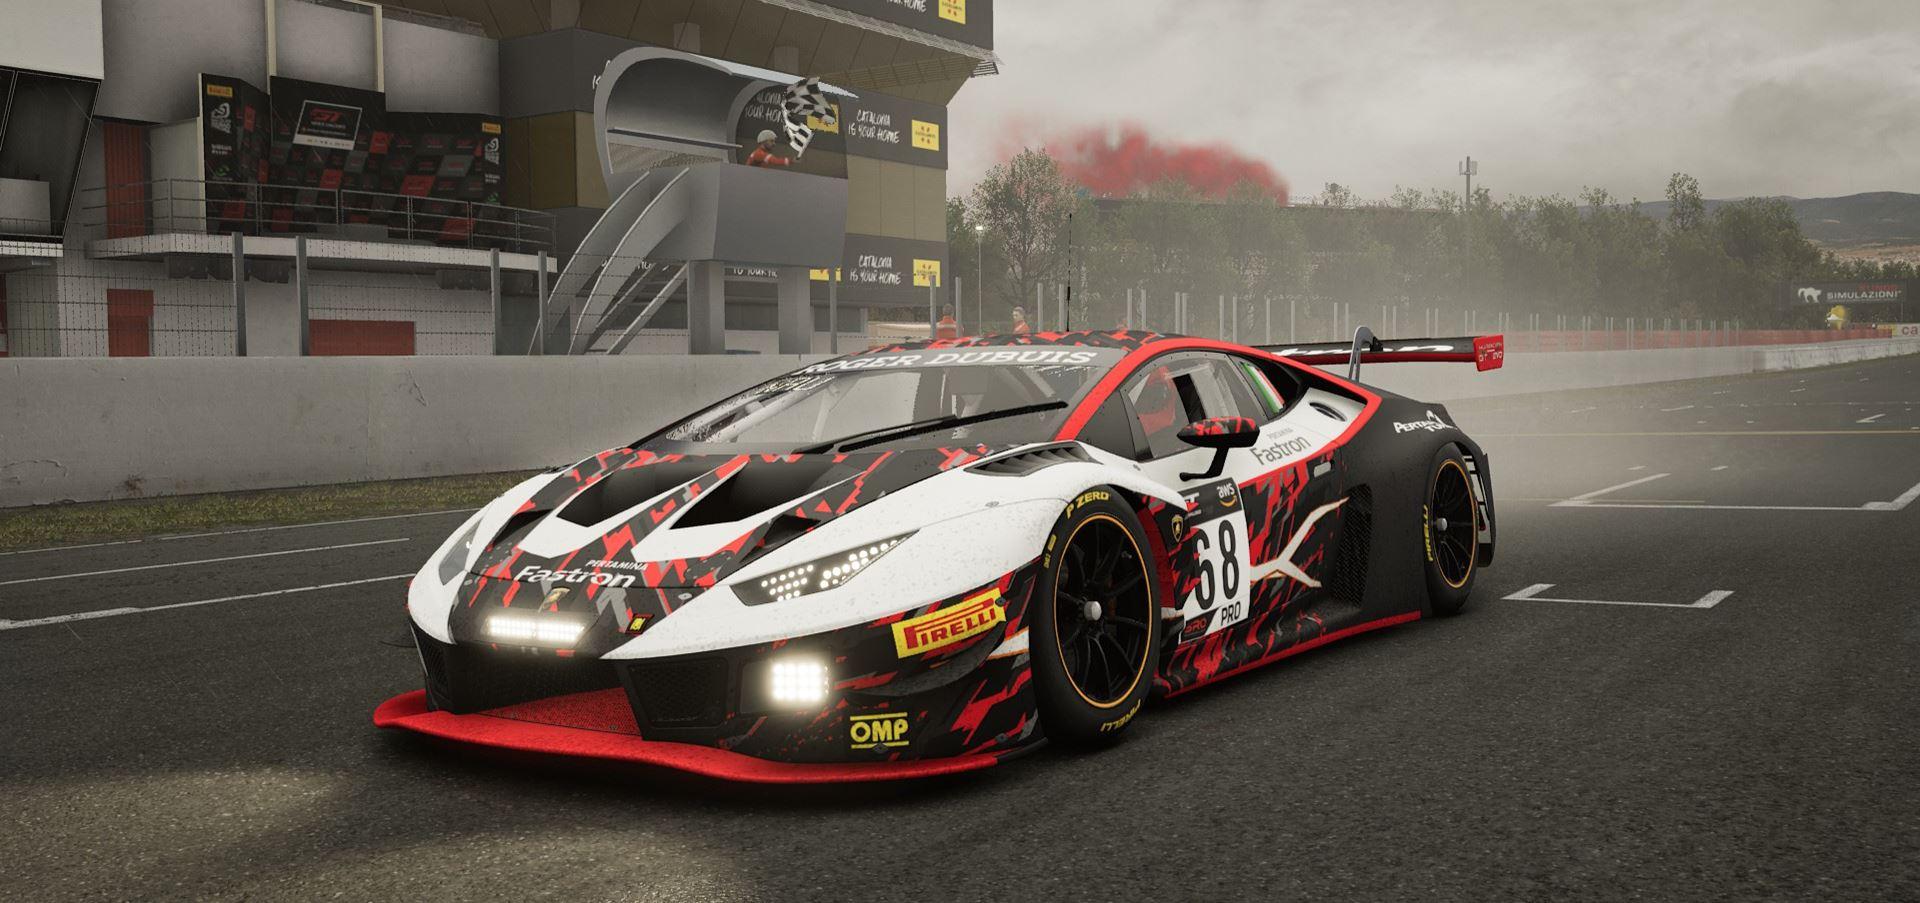 Lamborghini eSports: Nils Naujoks Crowned Champion...